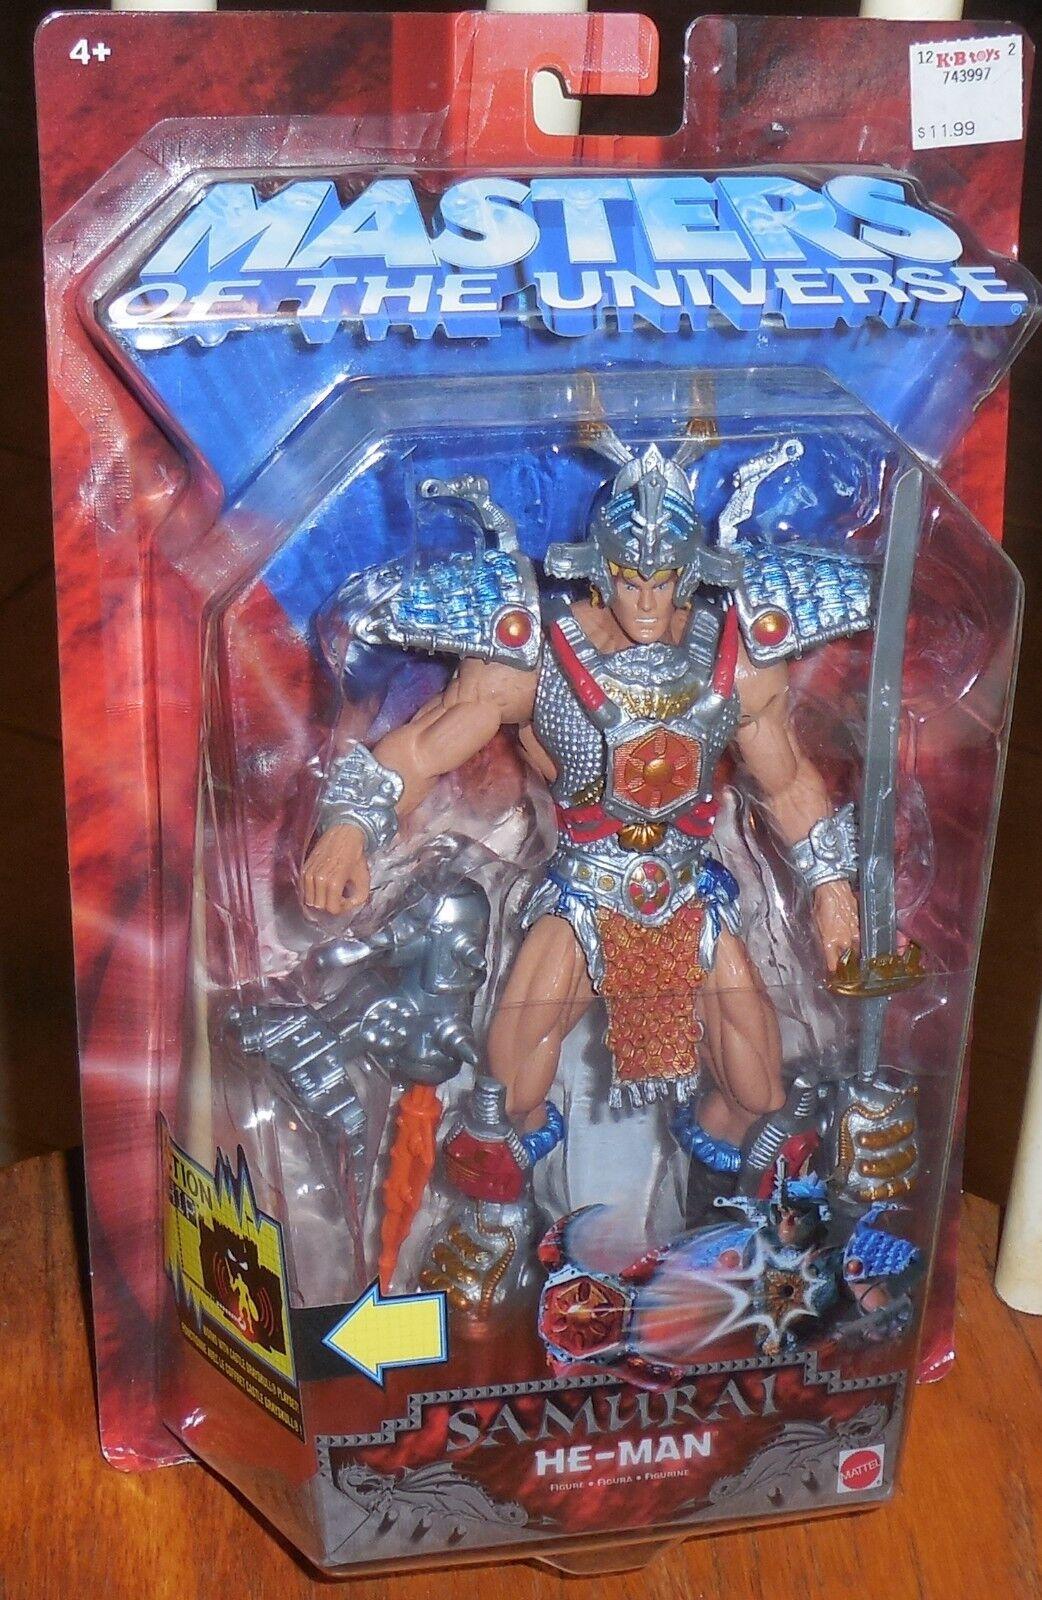 Motu Samurai He-Man Nuevo 2002 200x Masters Of The Universe Mosc Nuevo